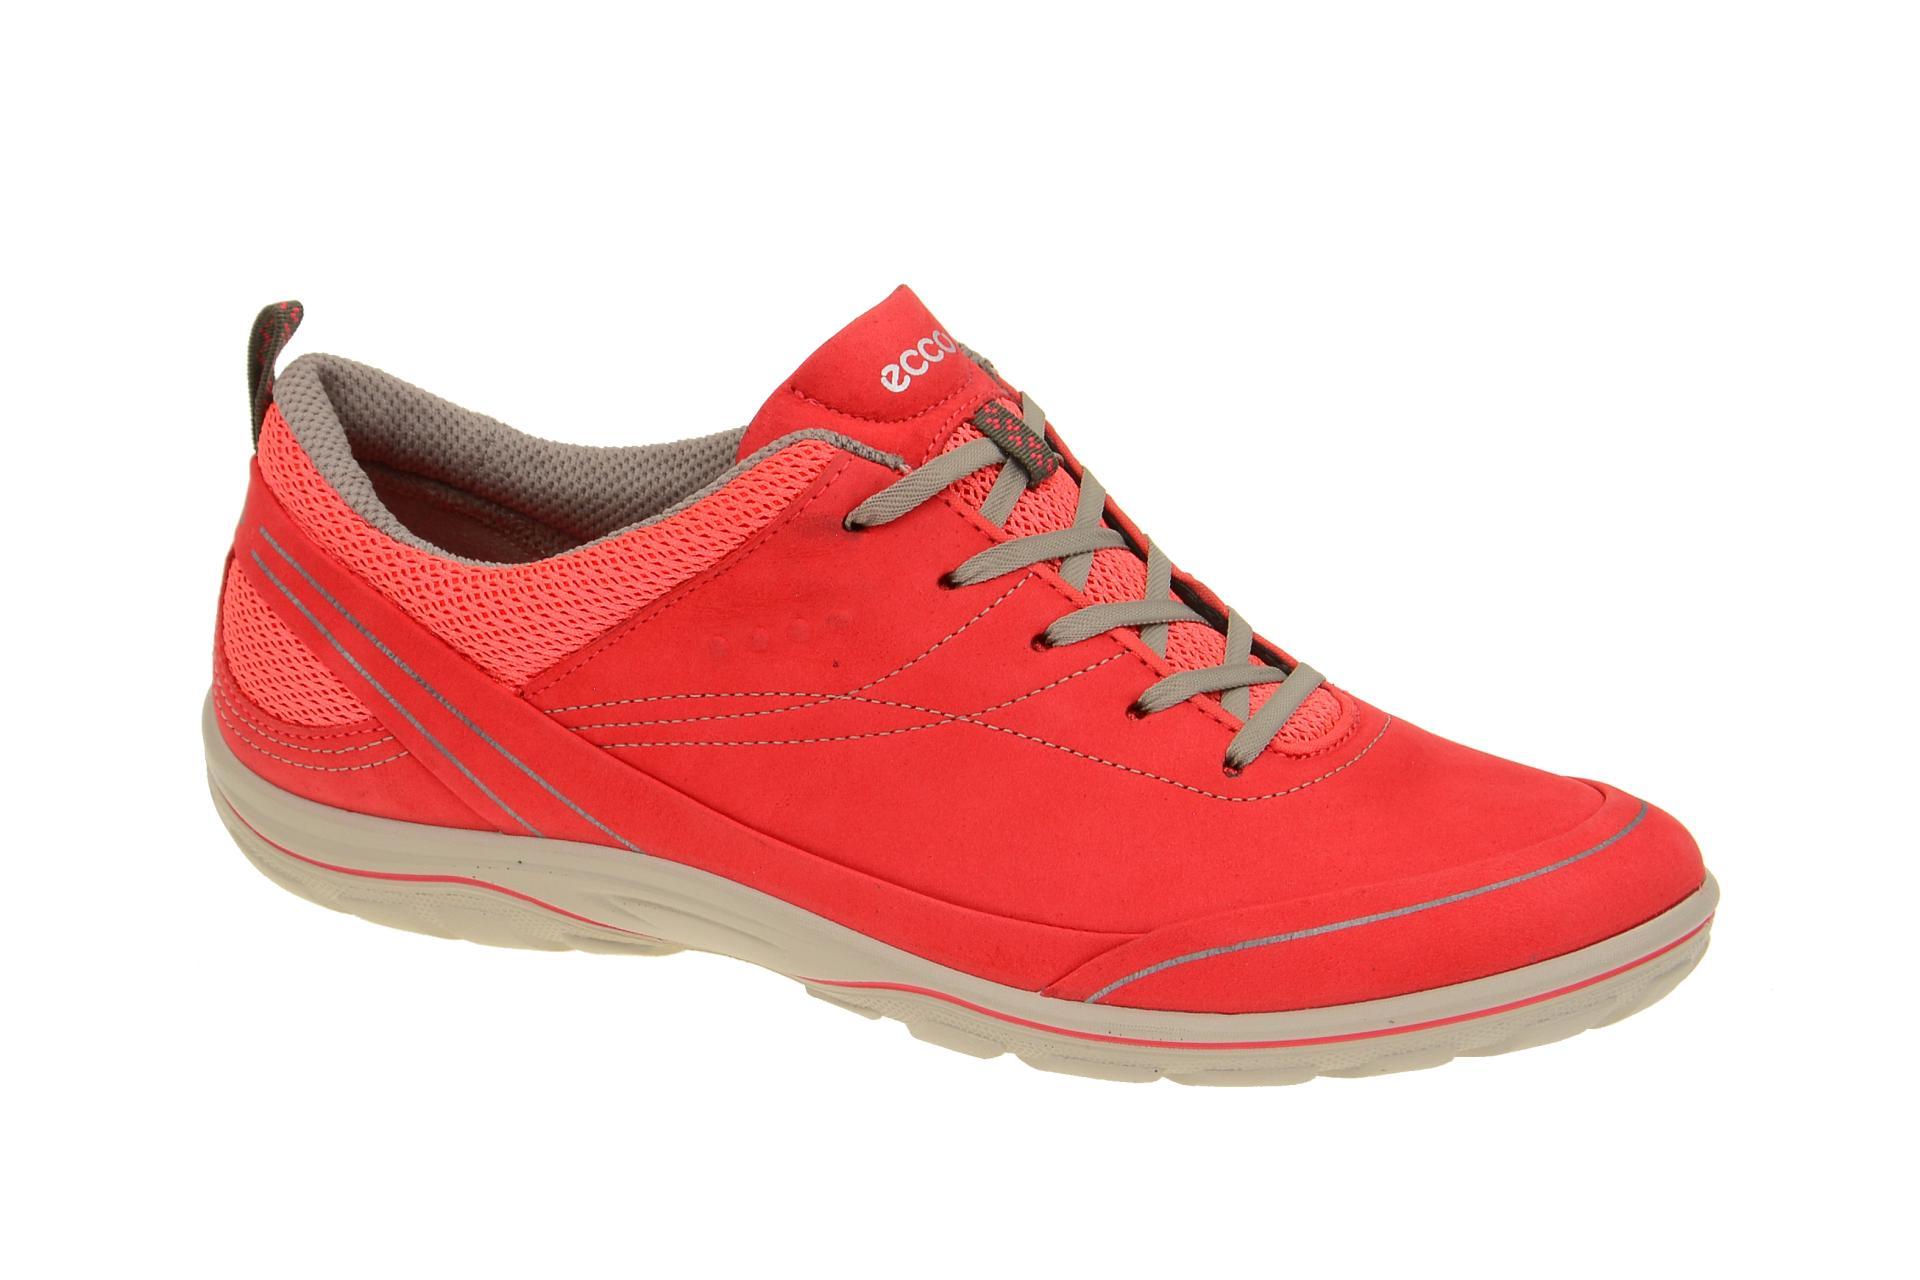 d3cc5b7061e63d Ecco Arizona Schuhe pink coral